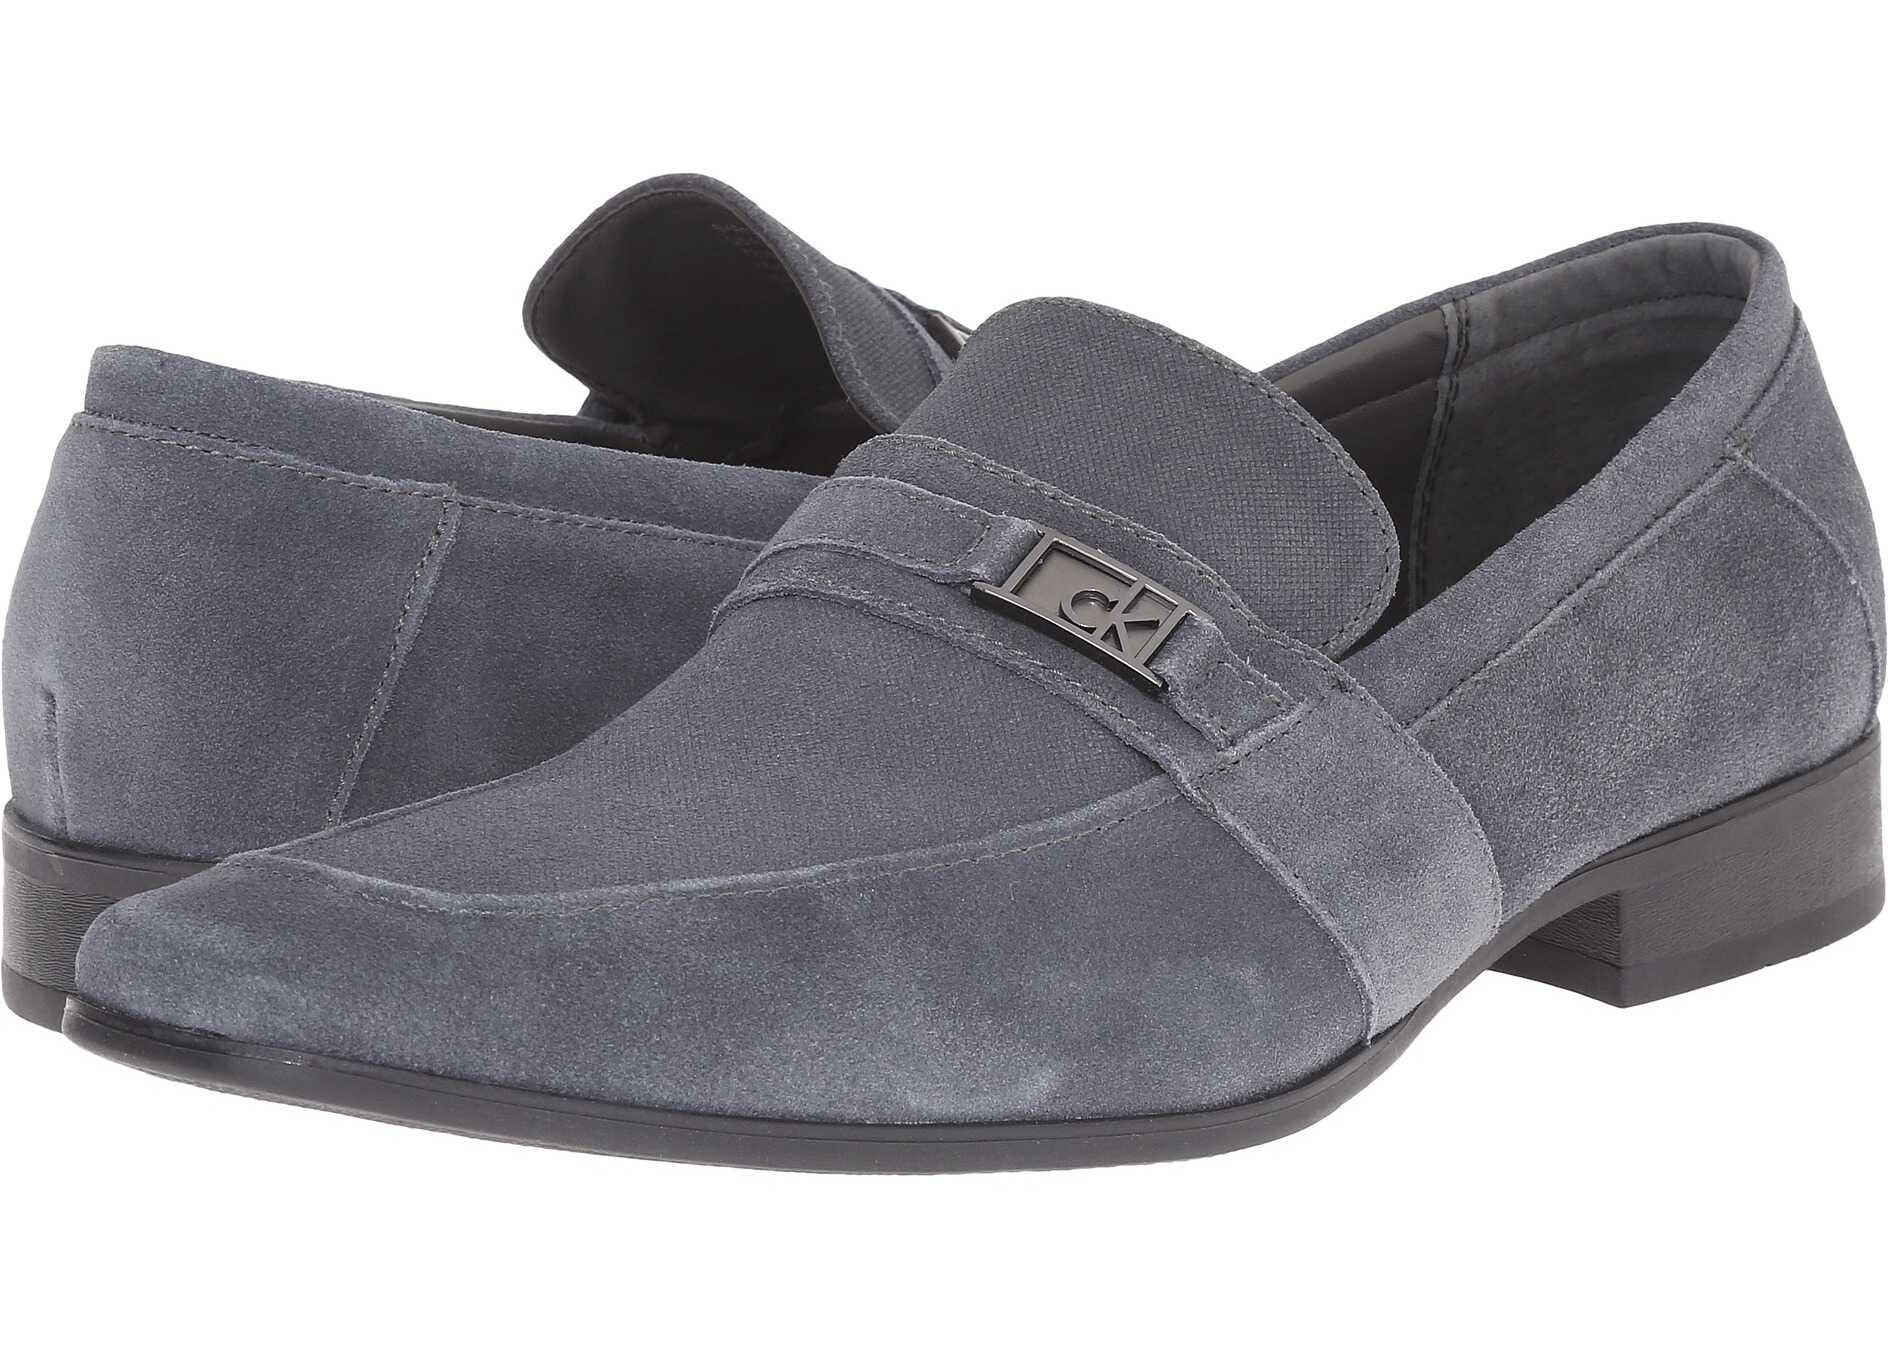 Grey Slip On Dress Shoes Mens